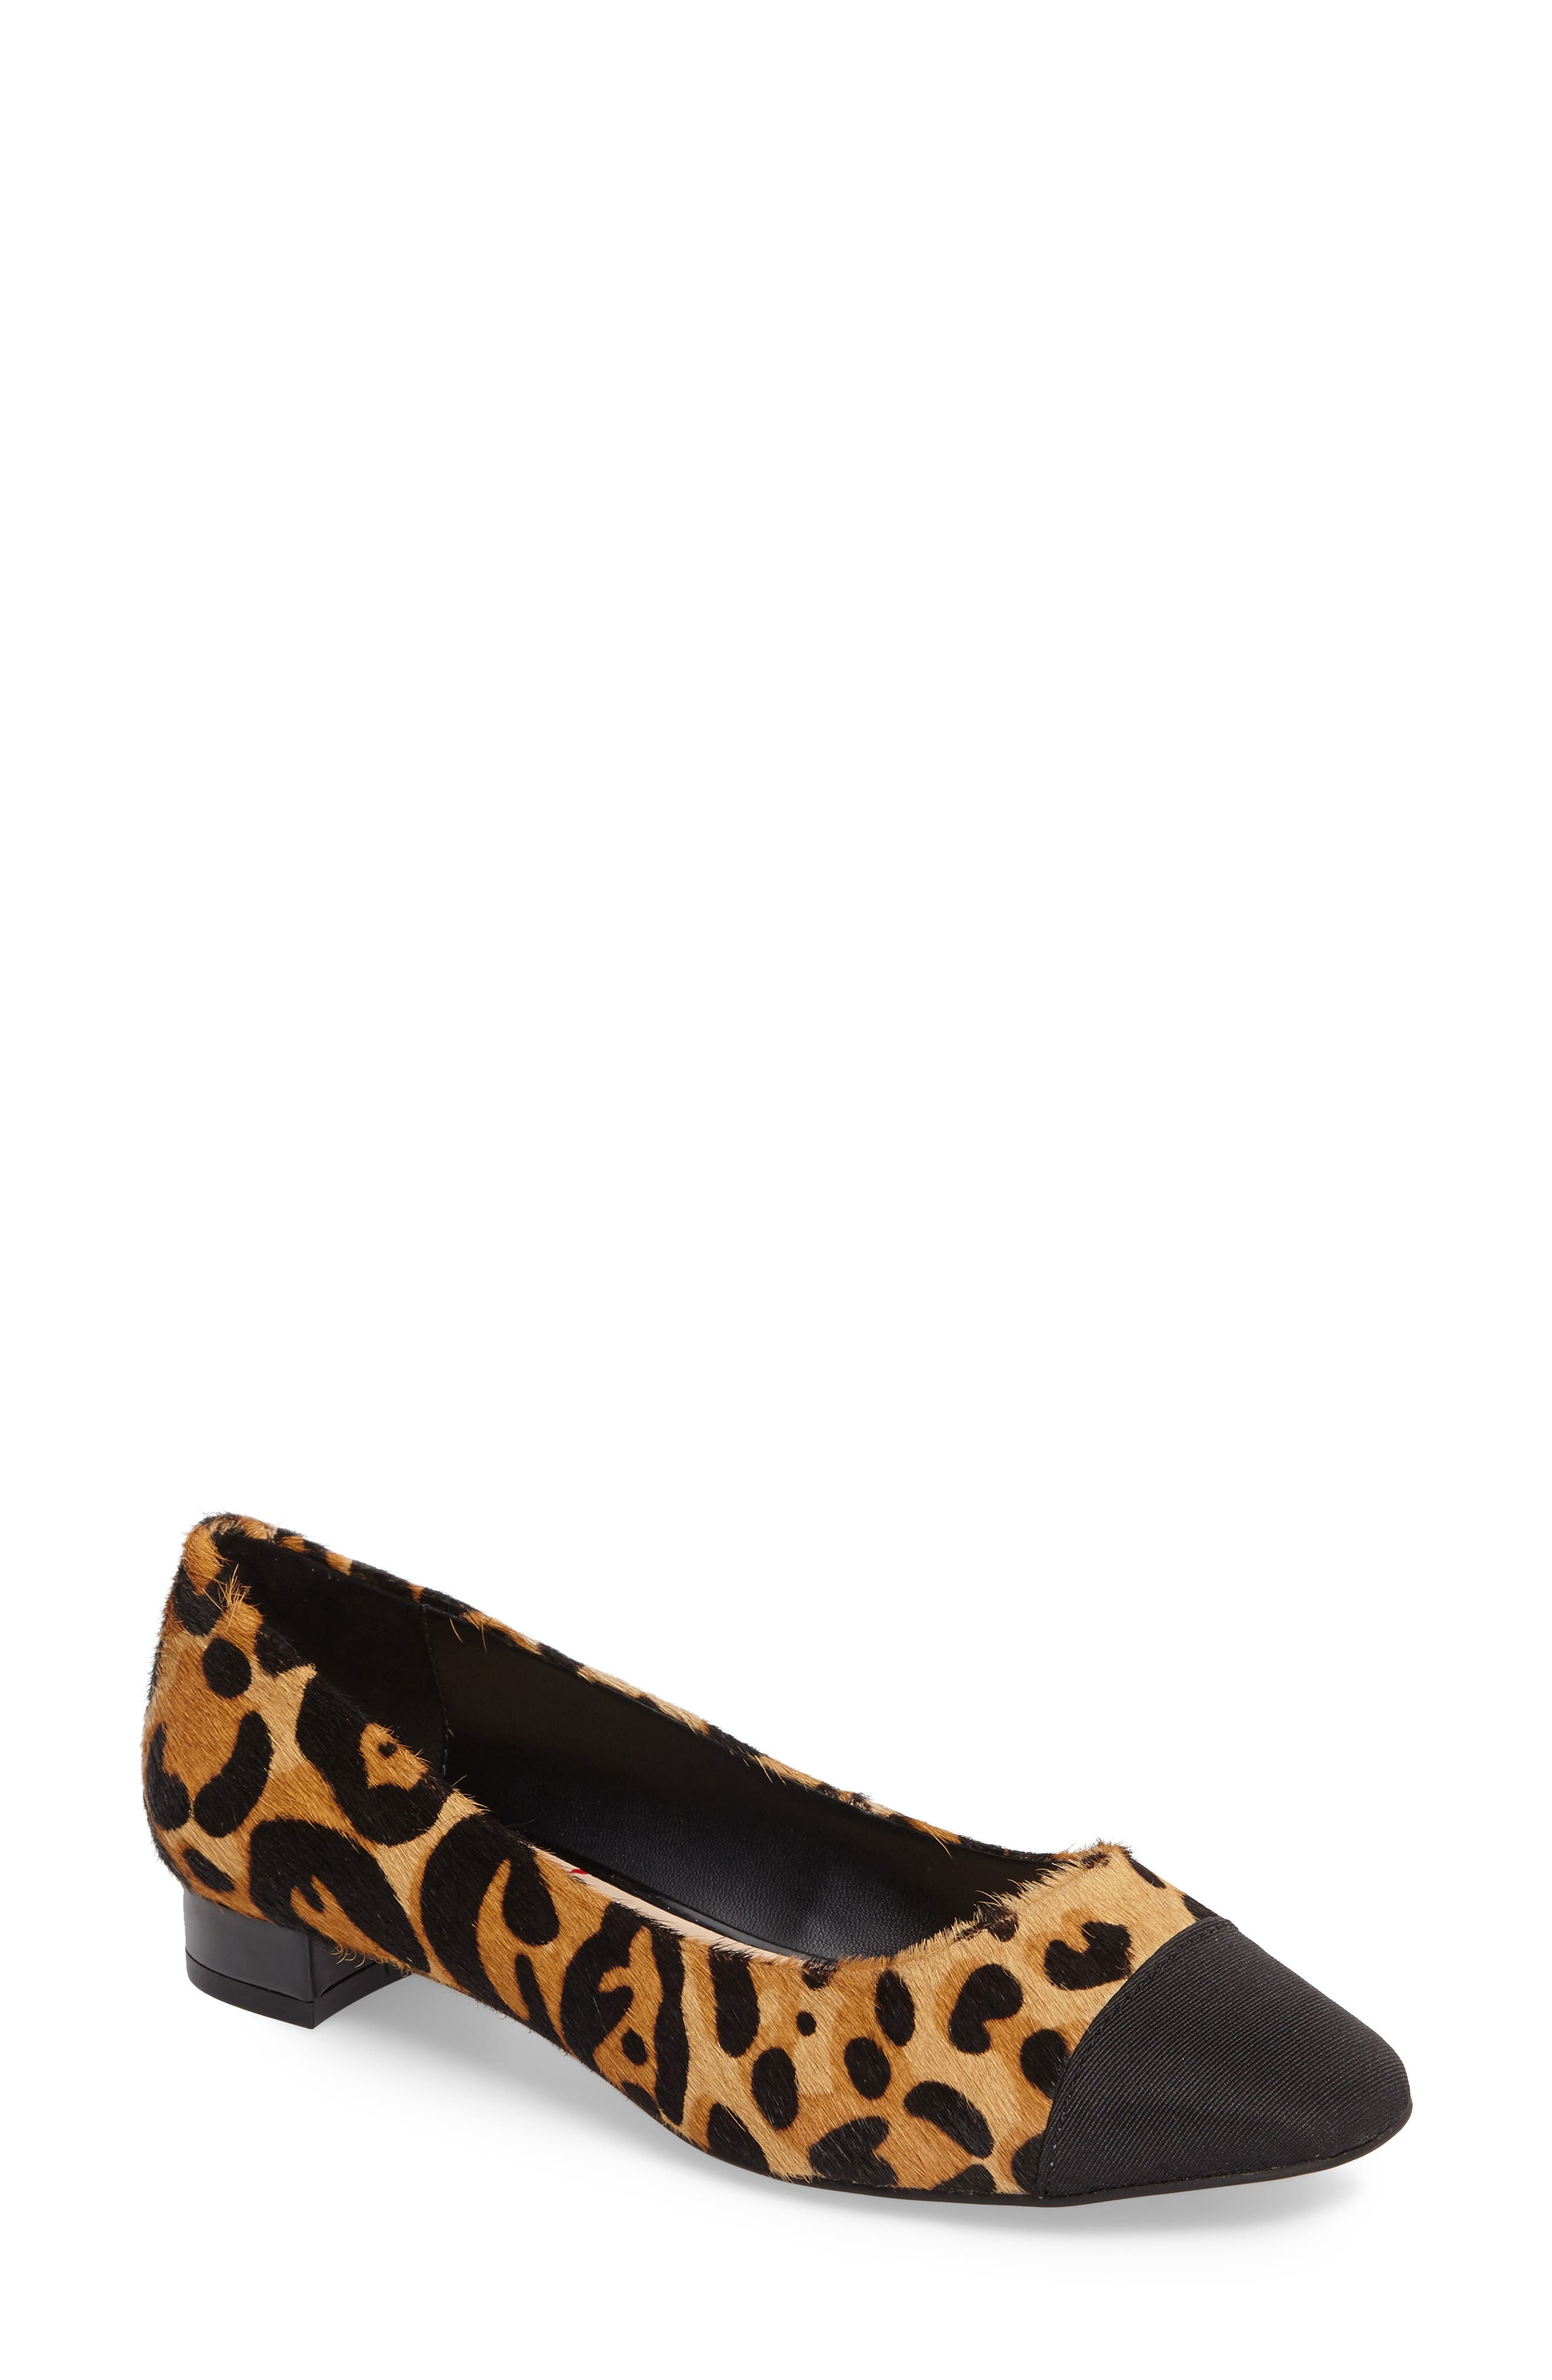 Brea Flat,                         Main,                         color, Leopard Calf Hair